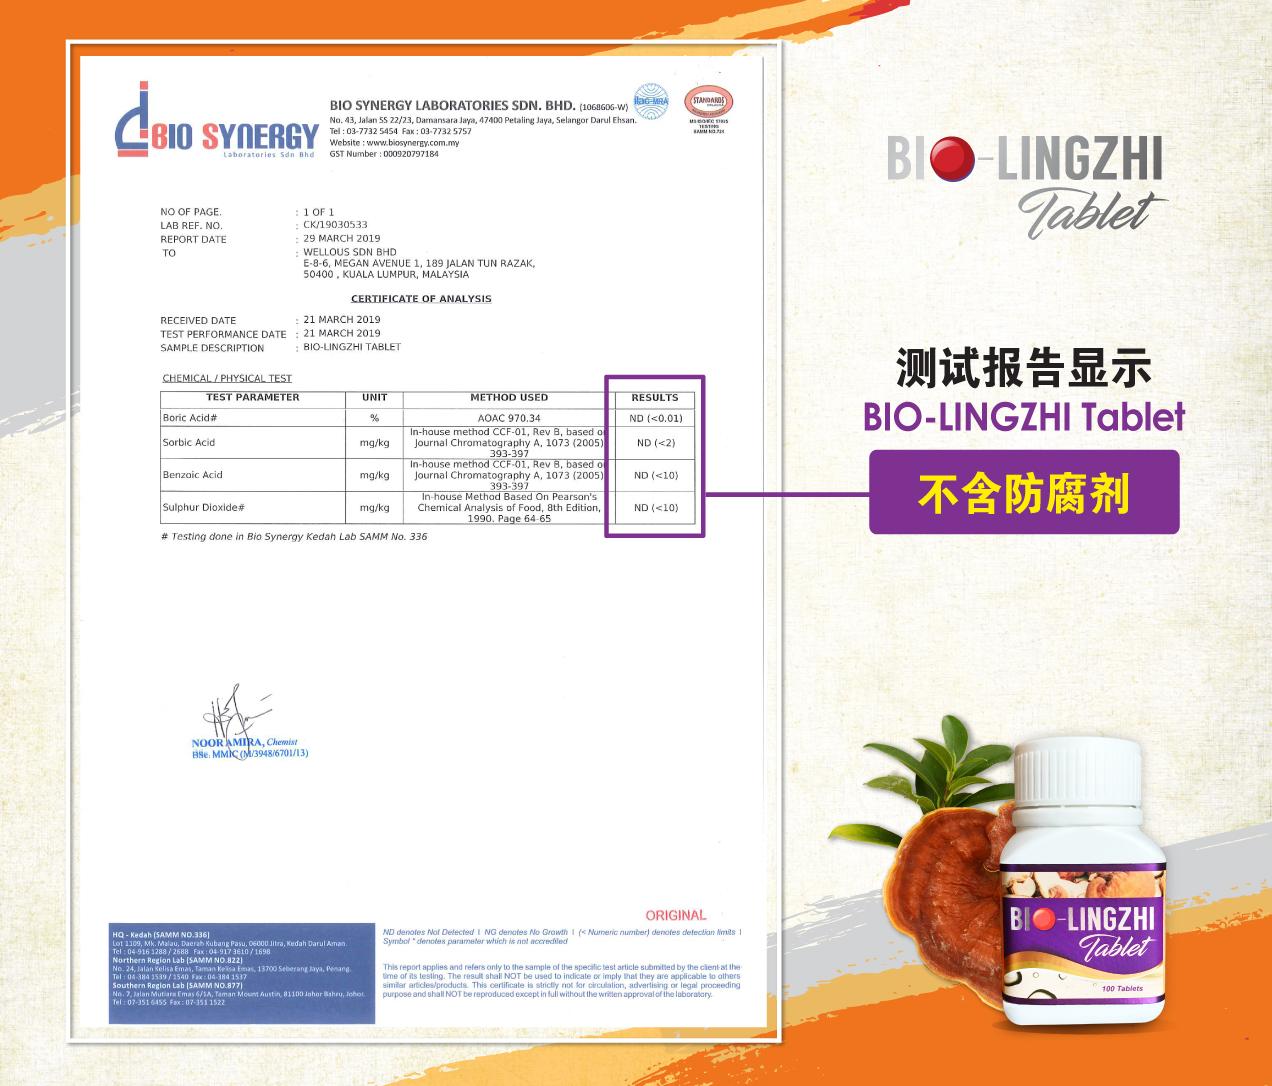 Bio-LingZhi_BioSynergy-Preservative-certificate_CN